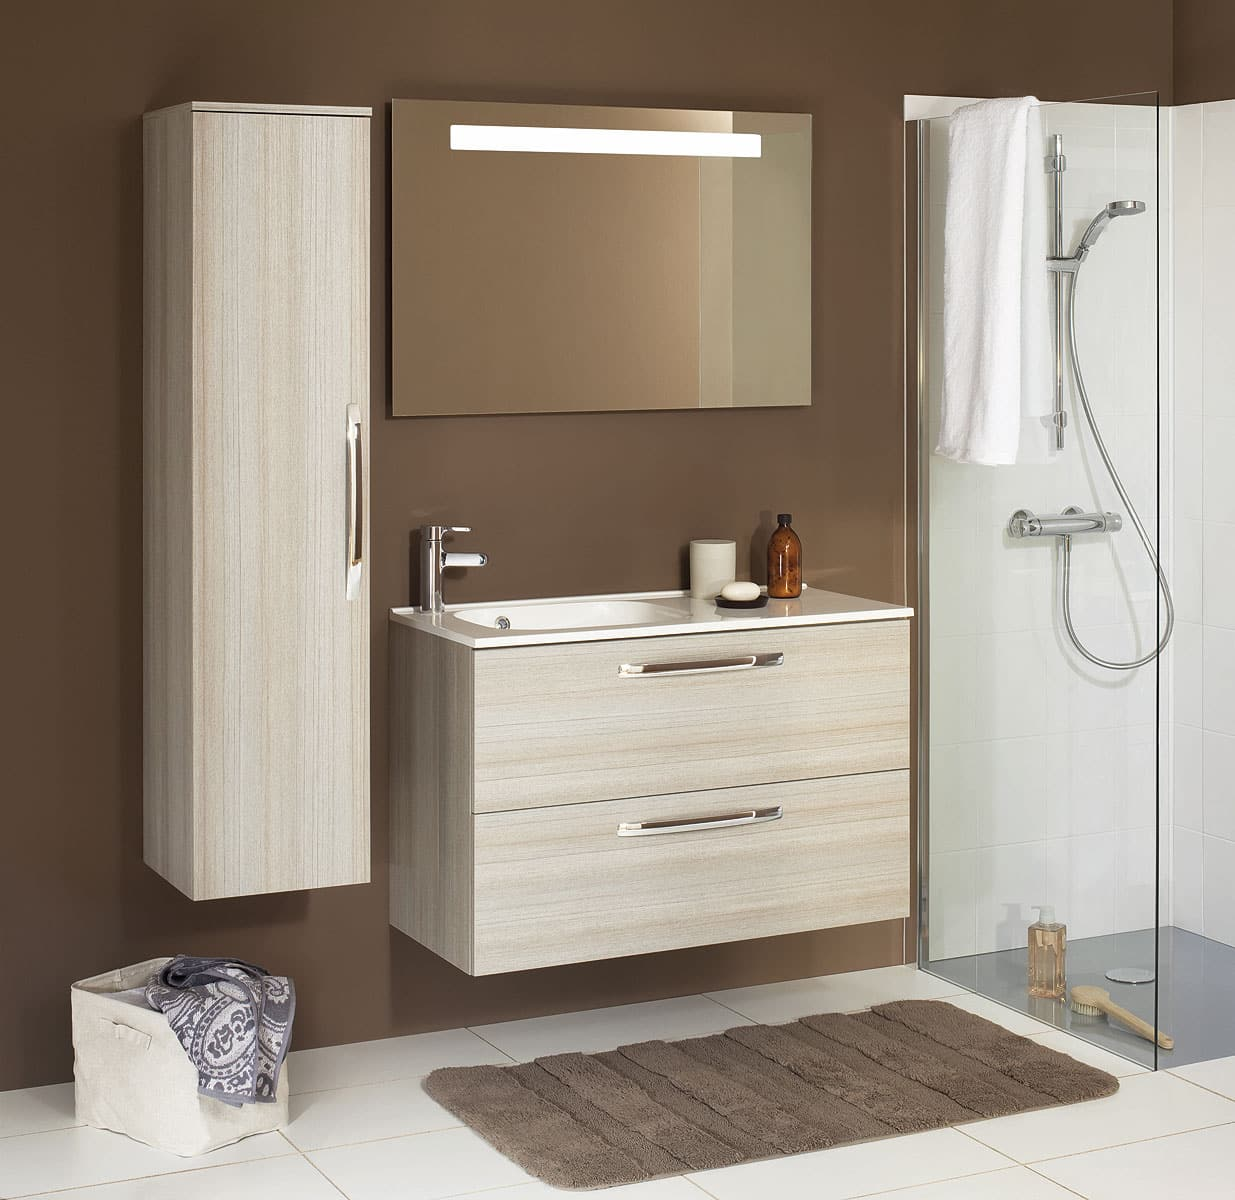 meubles-salle-de-bains-sanijura-impact - Servi\'Bat - Rénovation ...